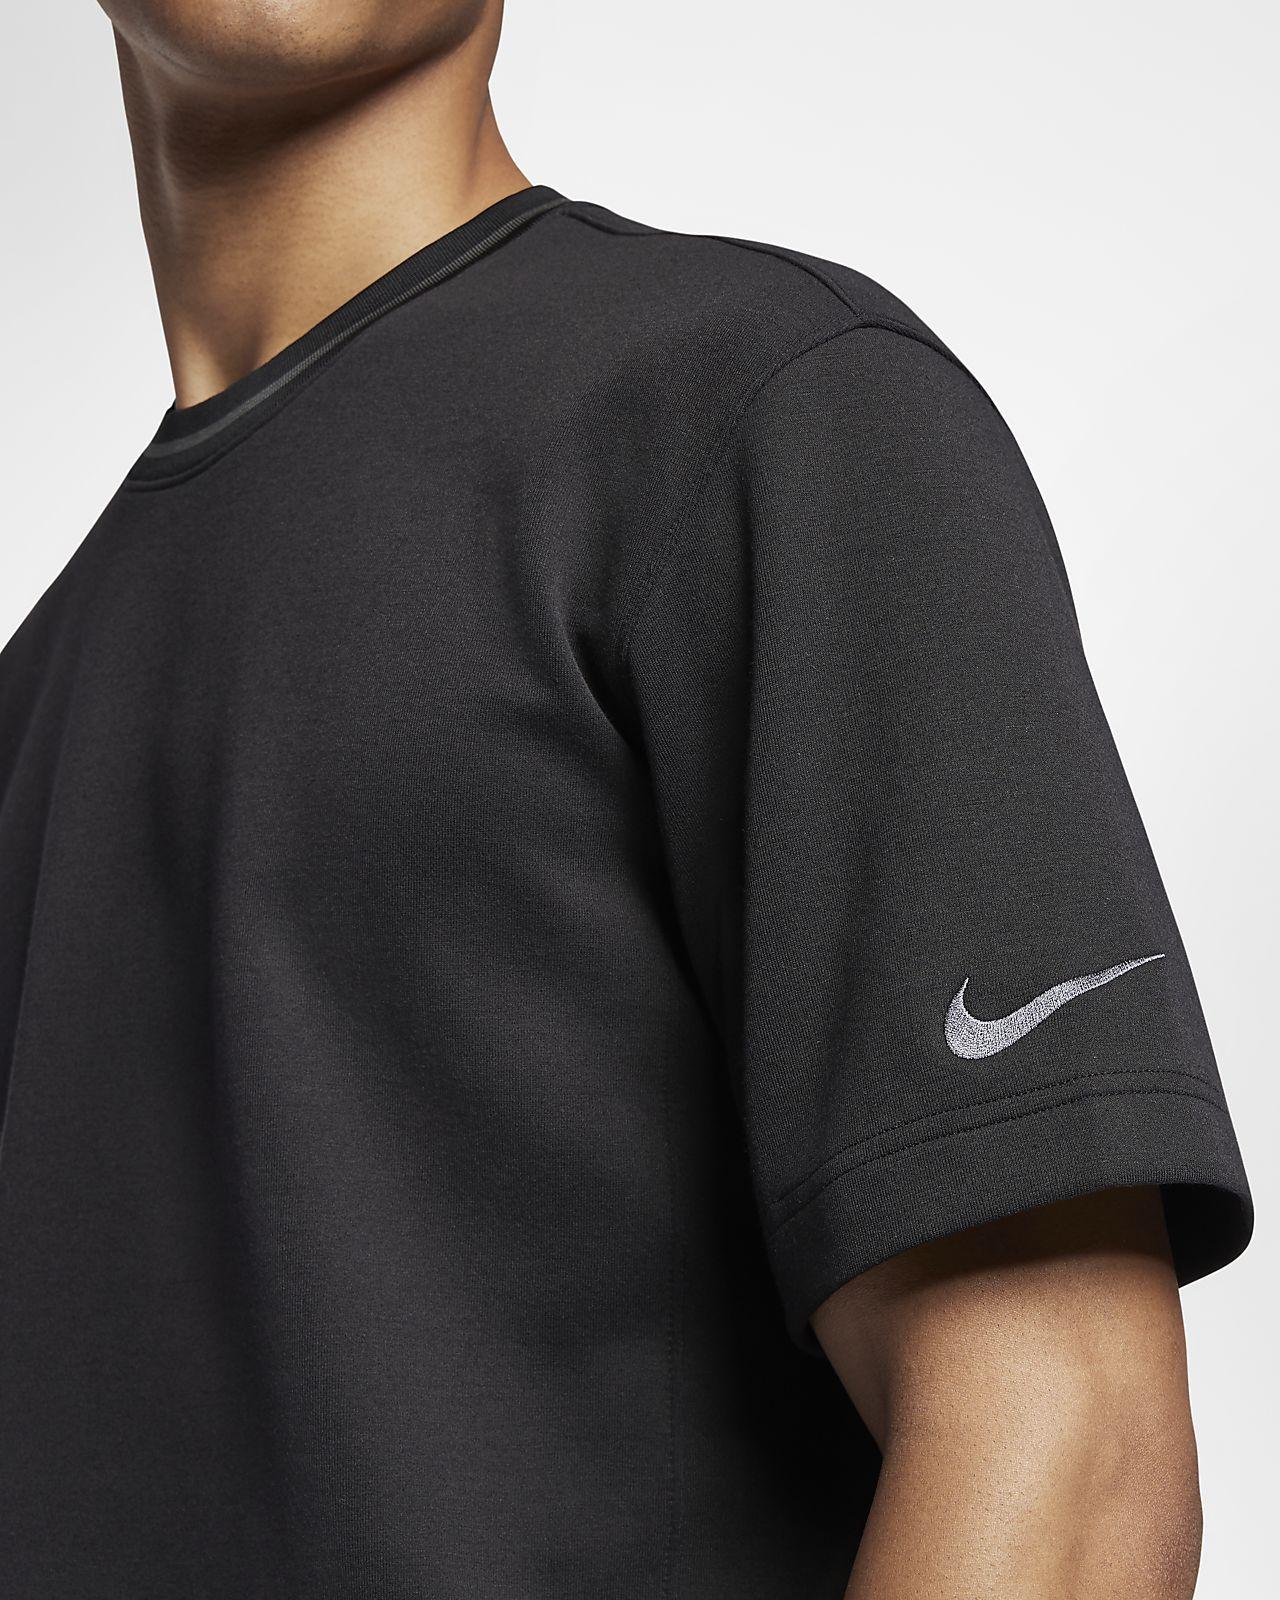 8e226d4b64a67 Nike Dri-FIT Men's Short-Sleeve Basketball Top. Nike.com GB